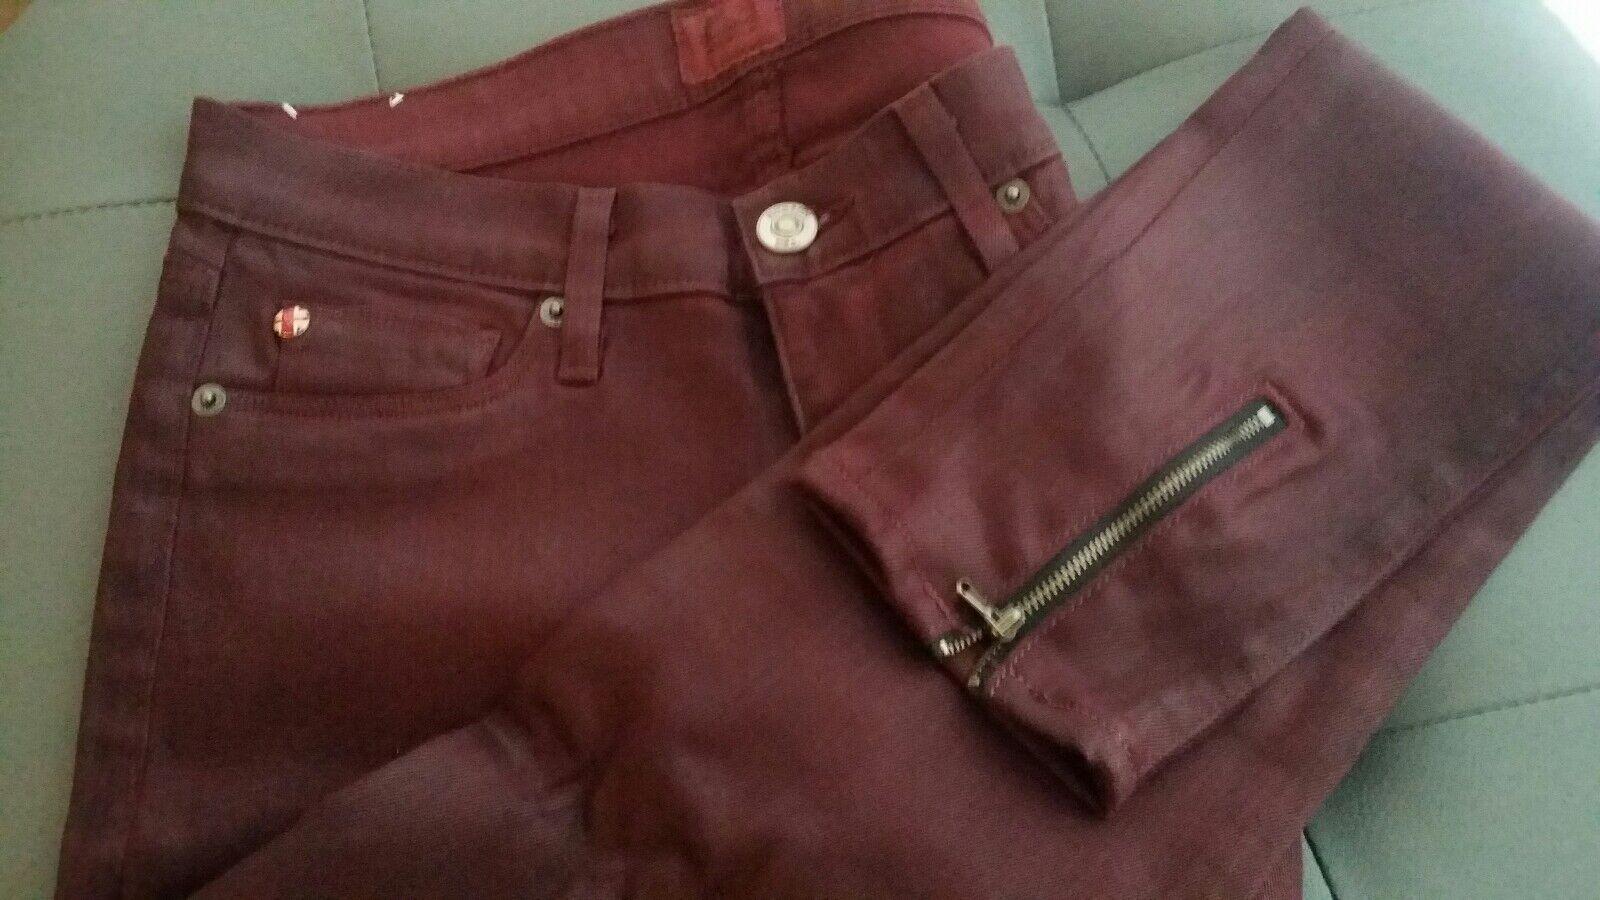 BN Hudson Juliette W28 32  inseam Refine Super Skinny Jeans